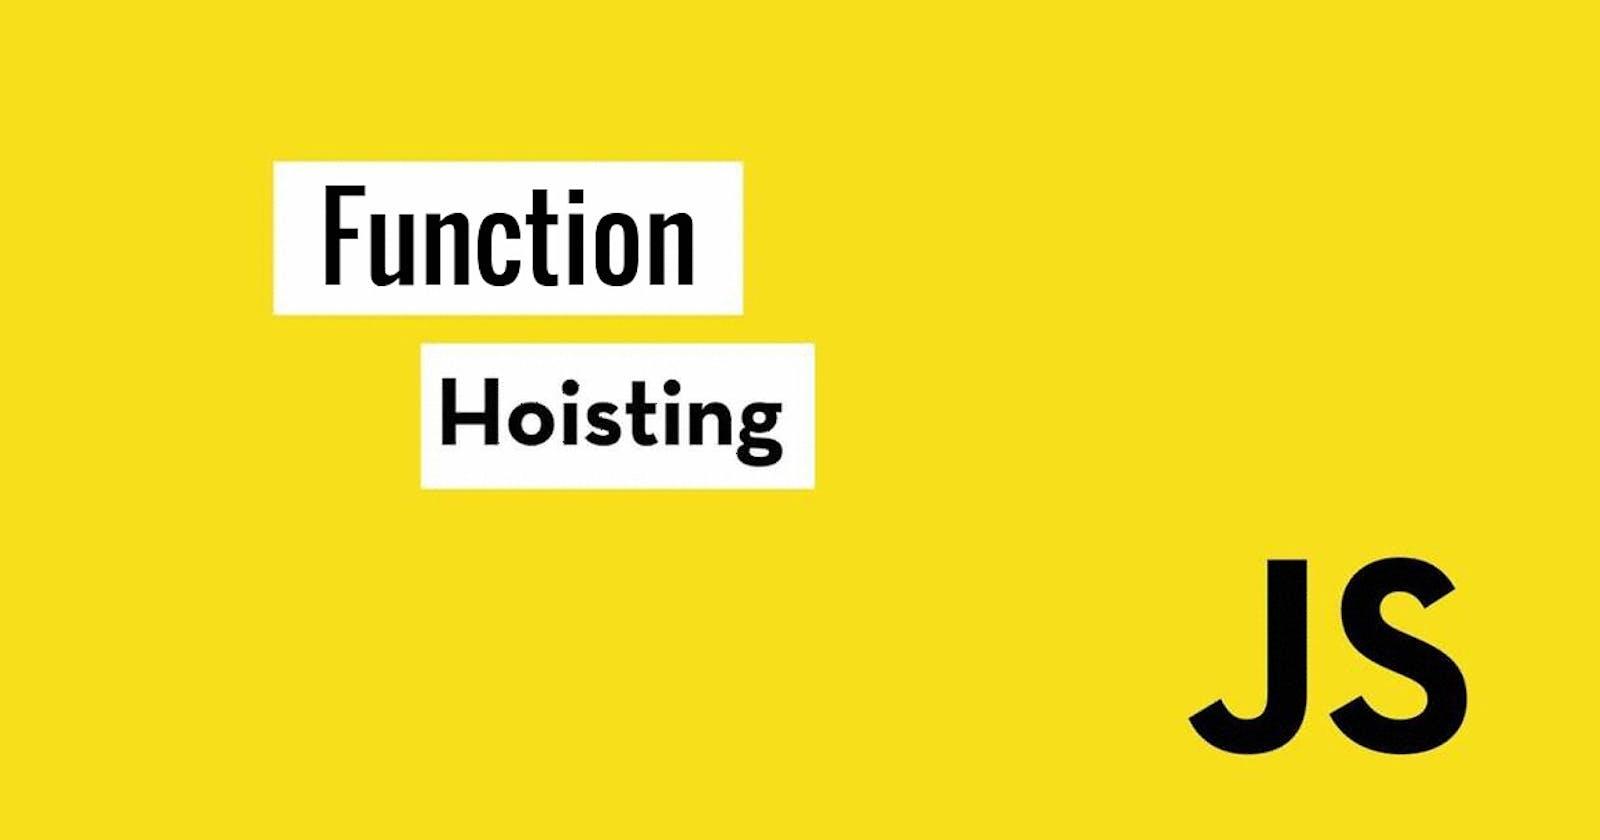 Function Hoisting in Javascript